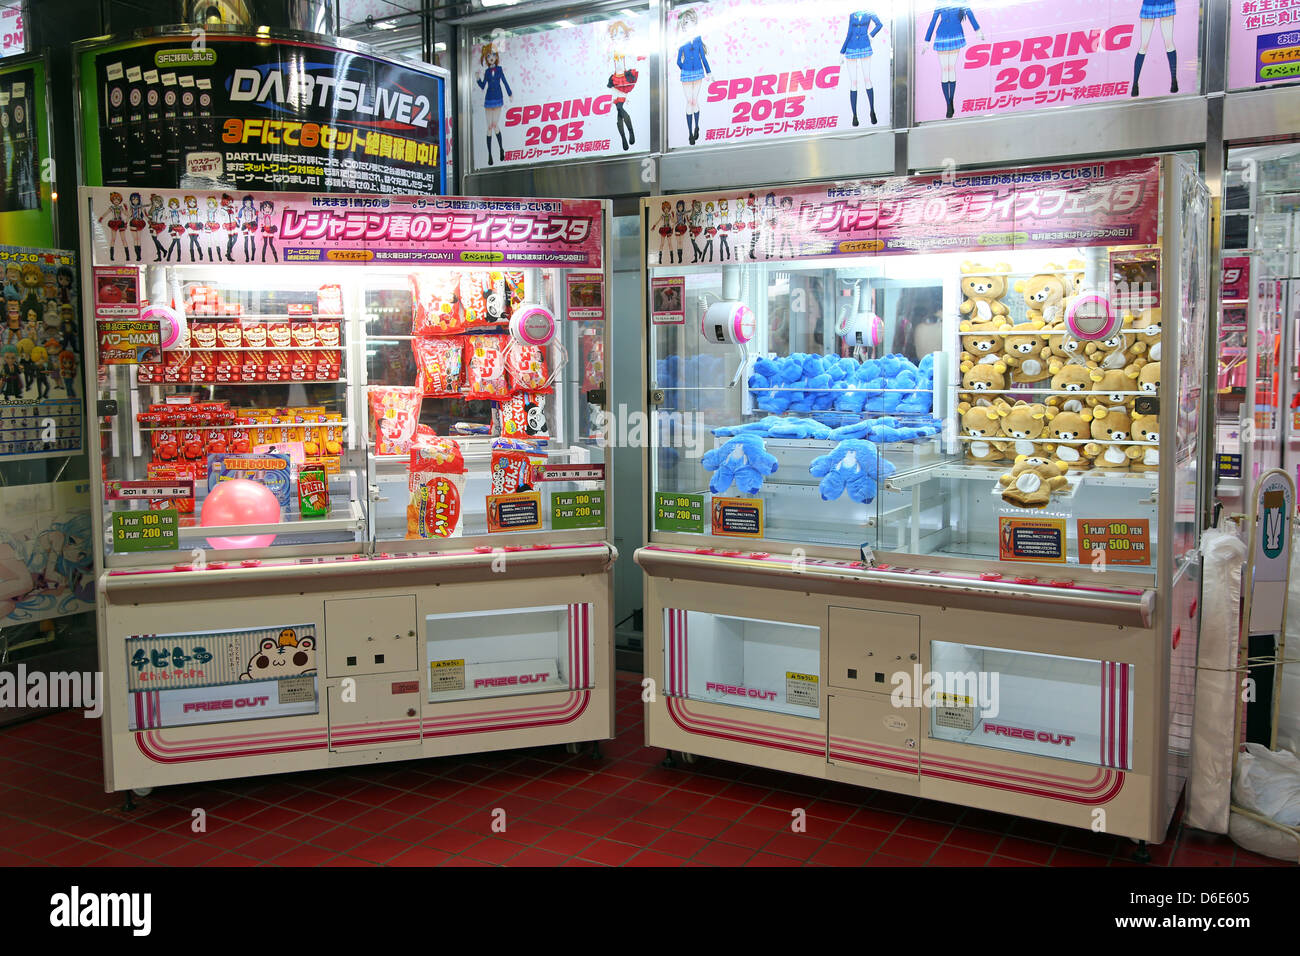 Rilakkuma bear soft toy crane machine in Akihabara Electric Town in Tokyo, Japan - Stock Image